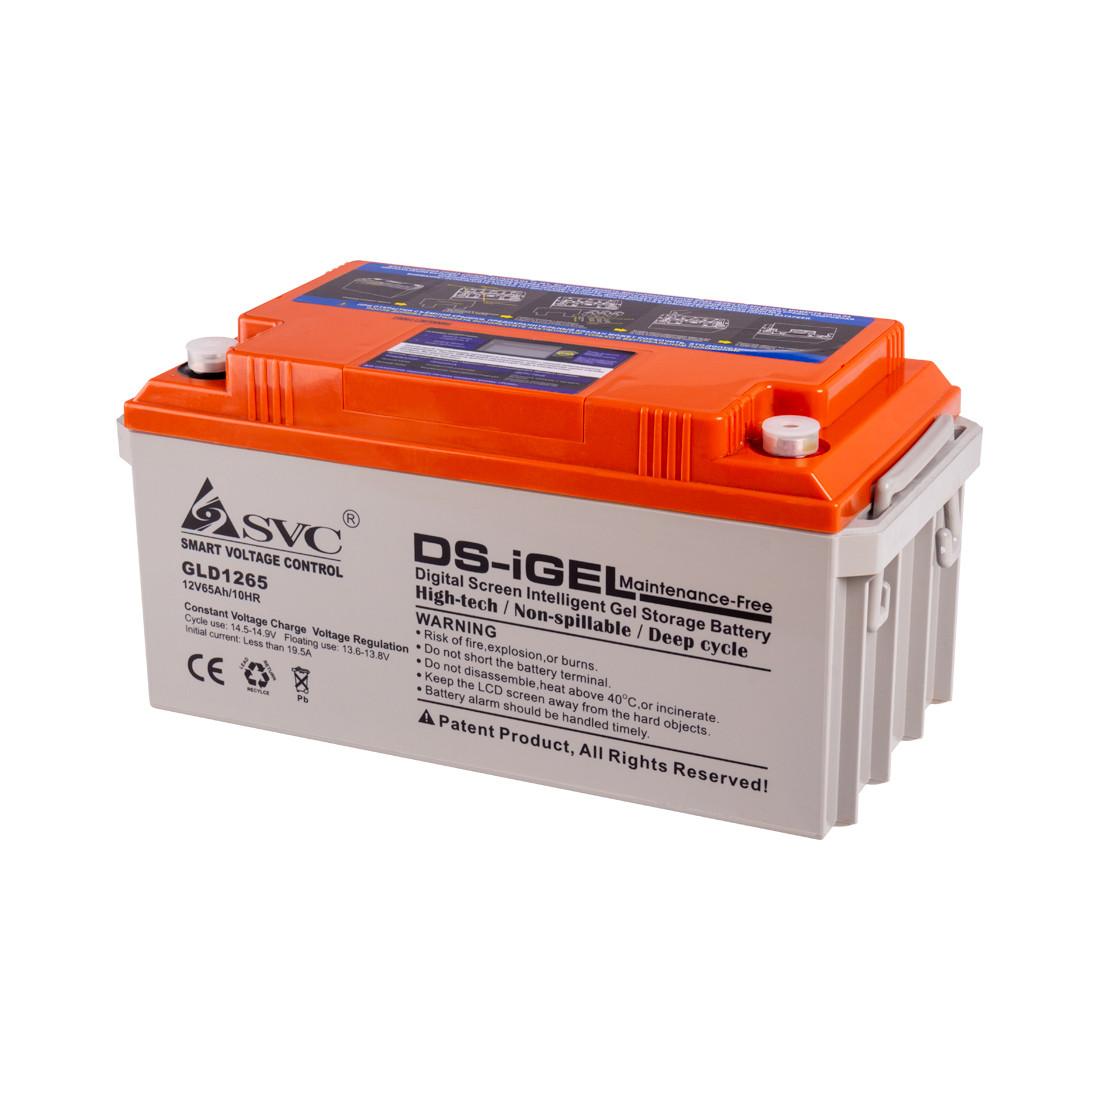 Батарея SVC GLD1265 гелевая 12В 65 Ач LED-дисплей